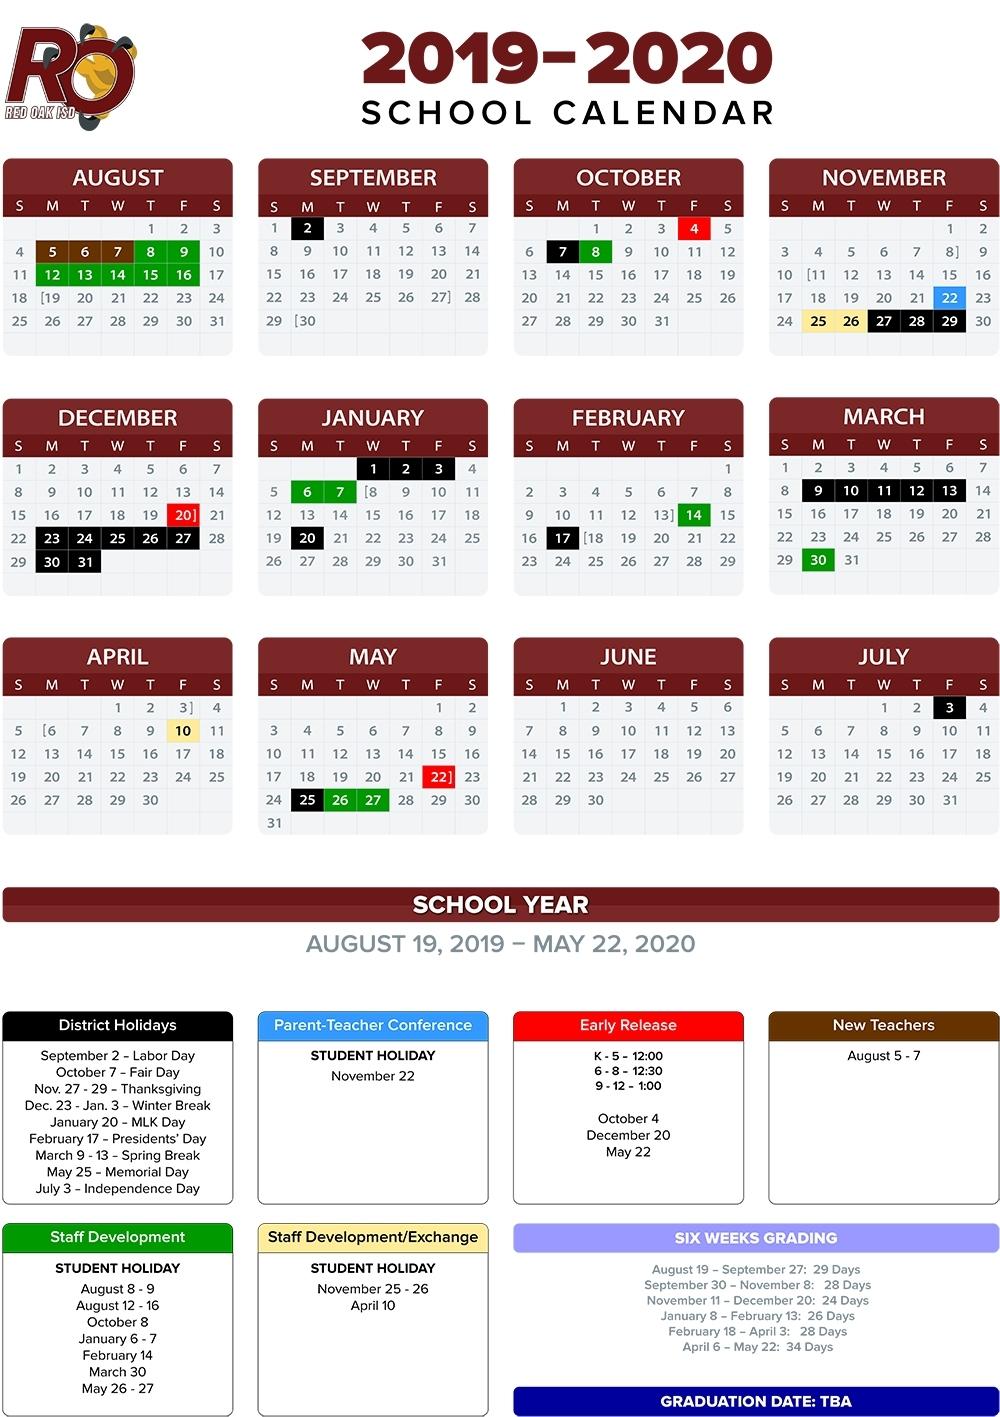 Annual School Calendar / Annual Calendar with Special Days Calendar 2019-2020